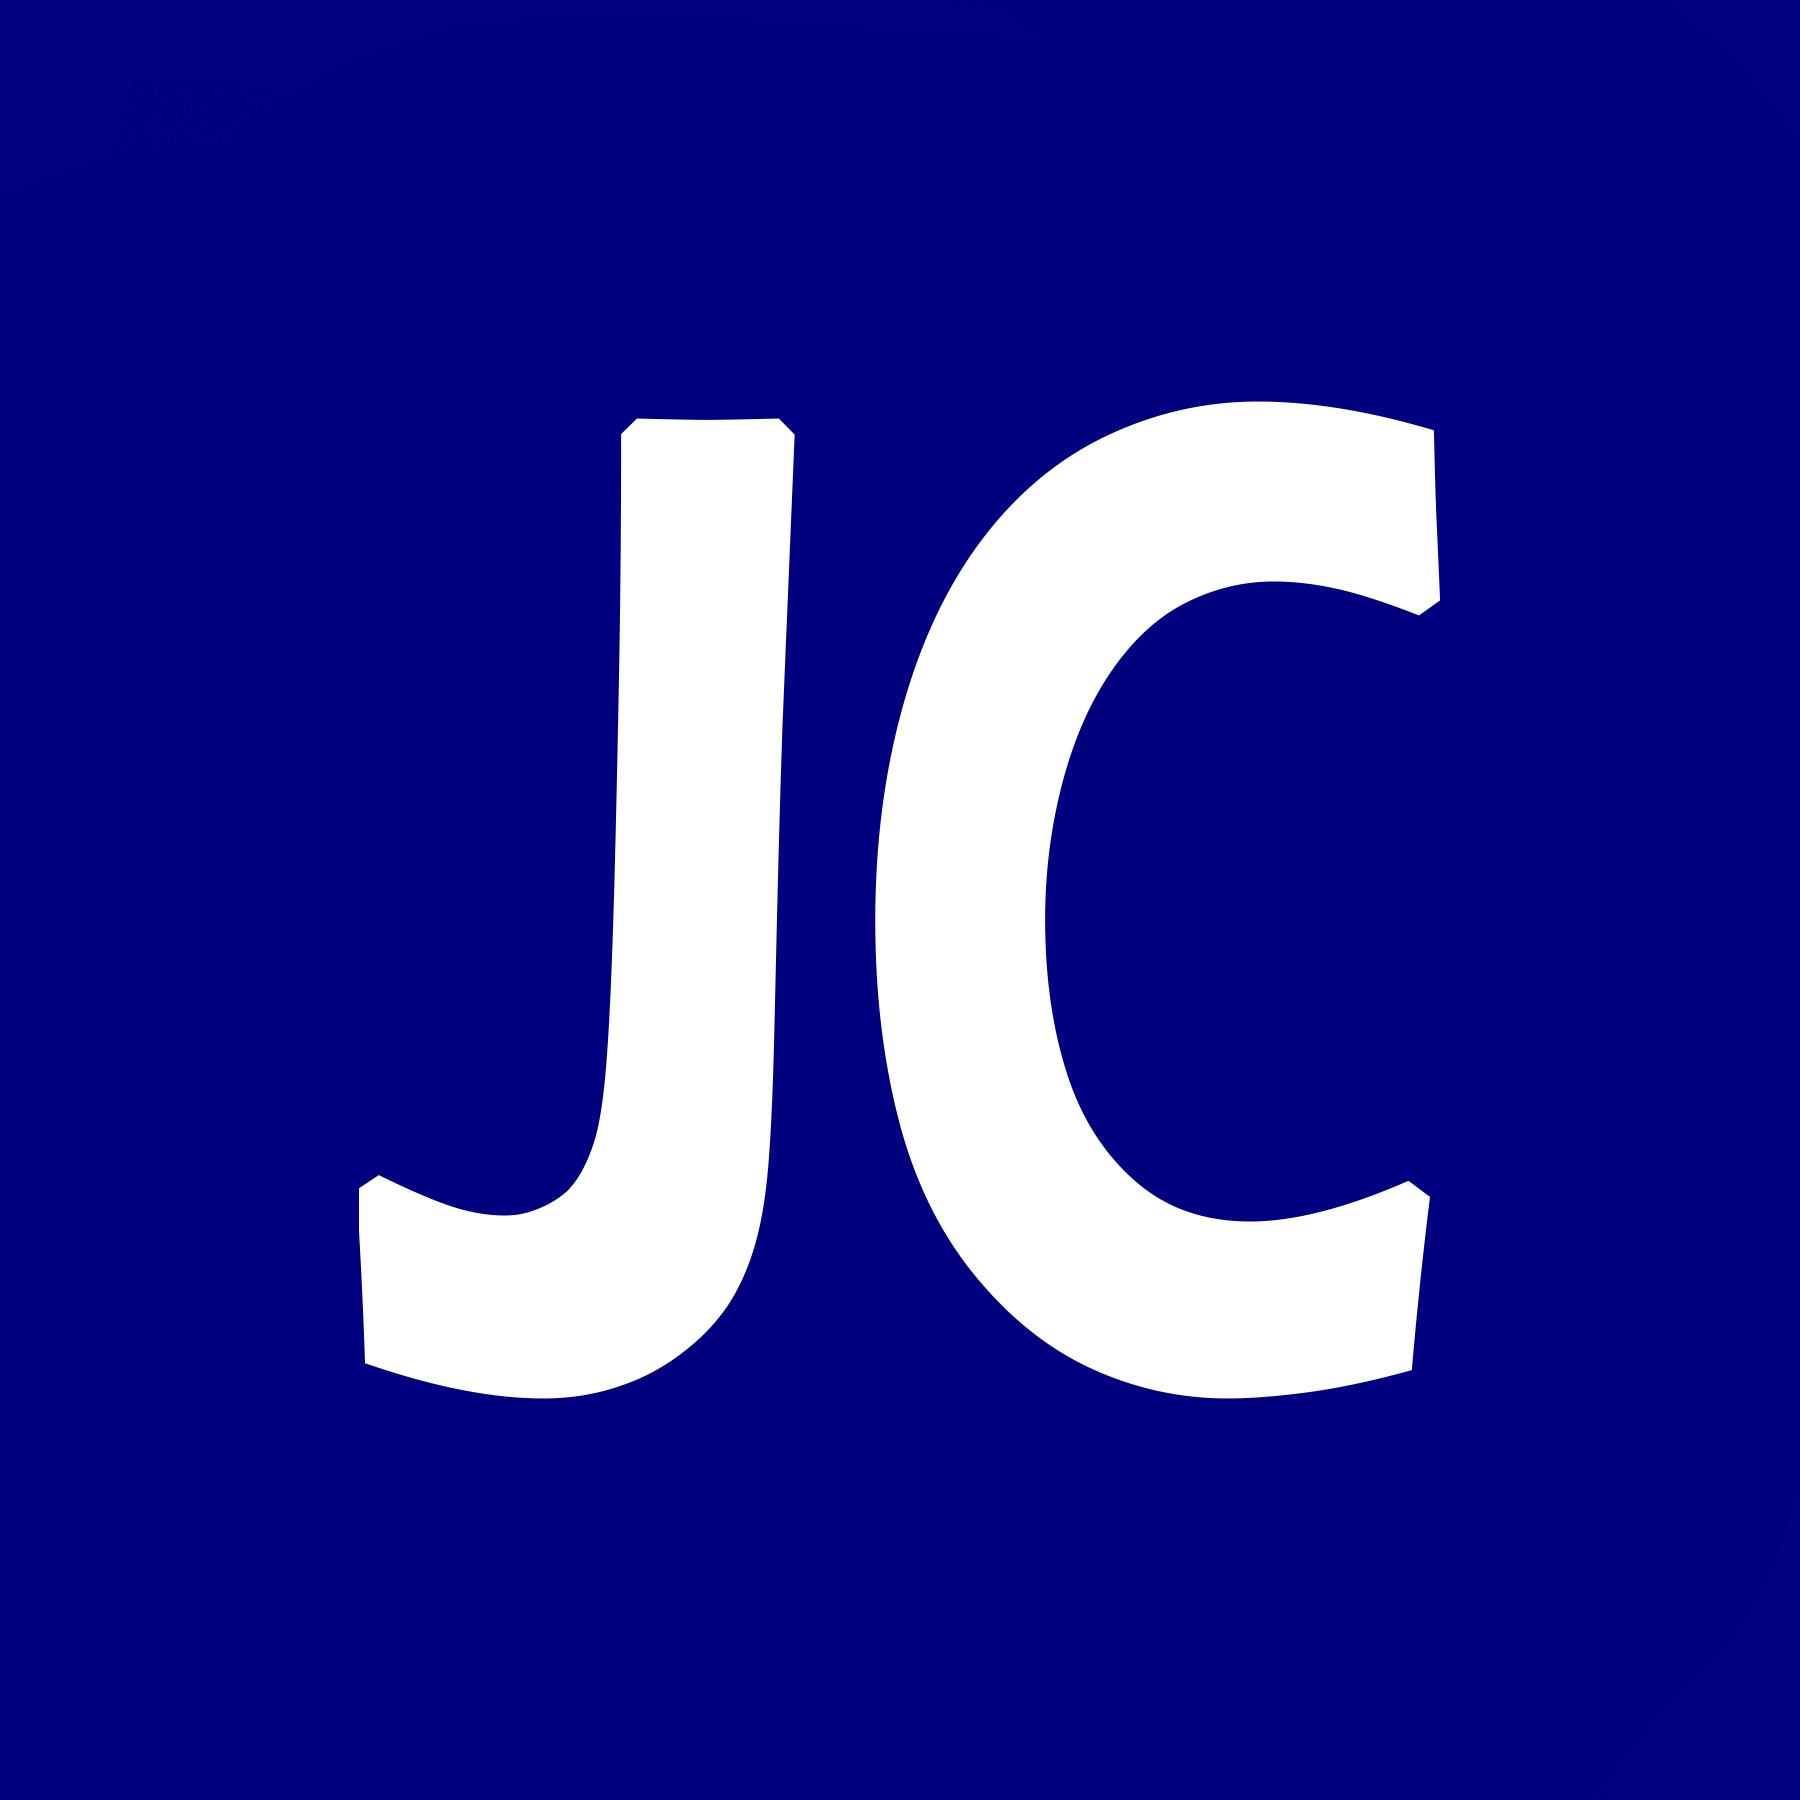 jbcosta